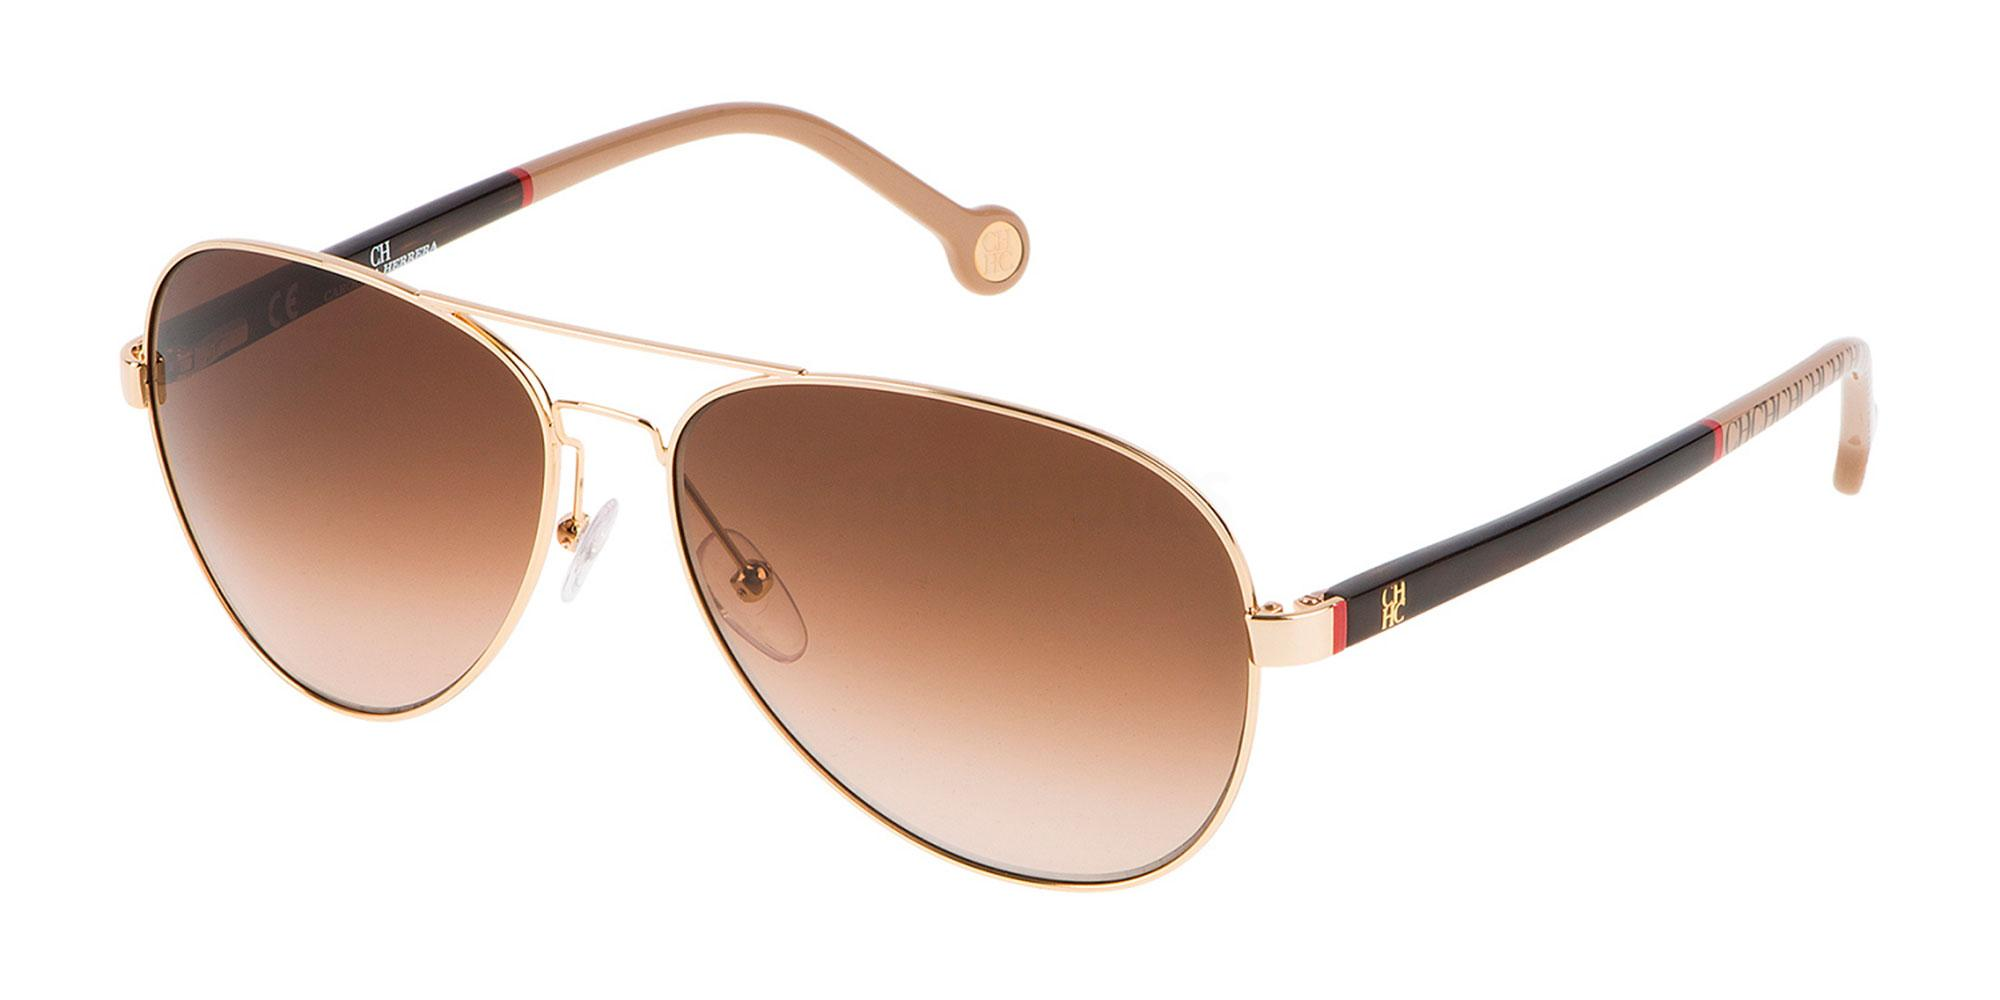 0300 SHE070 Sunglasses, CH Carolina Herrera